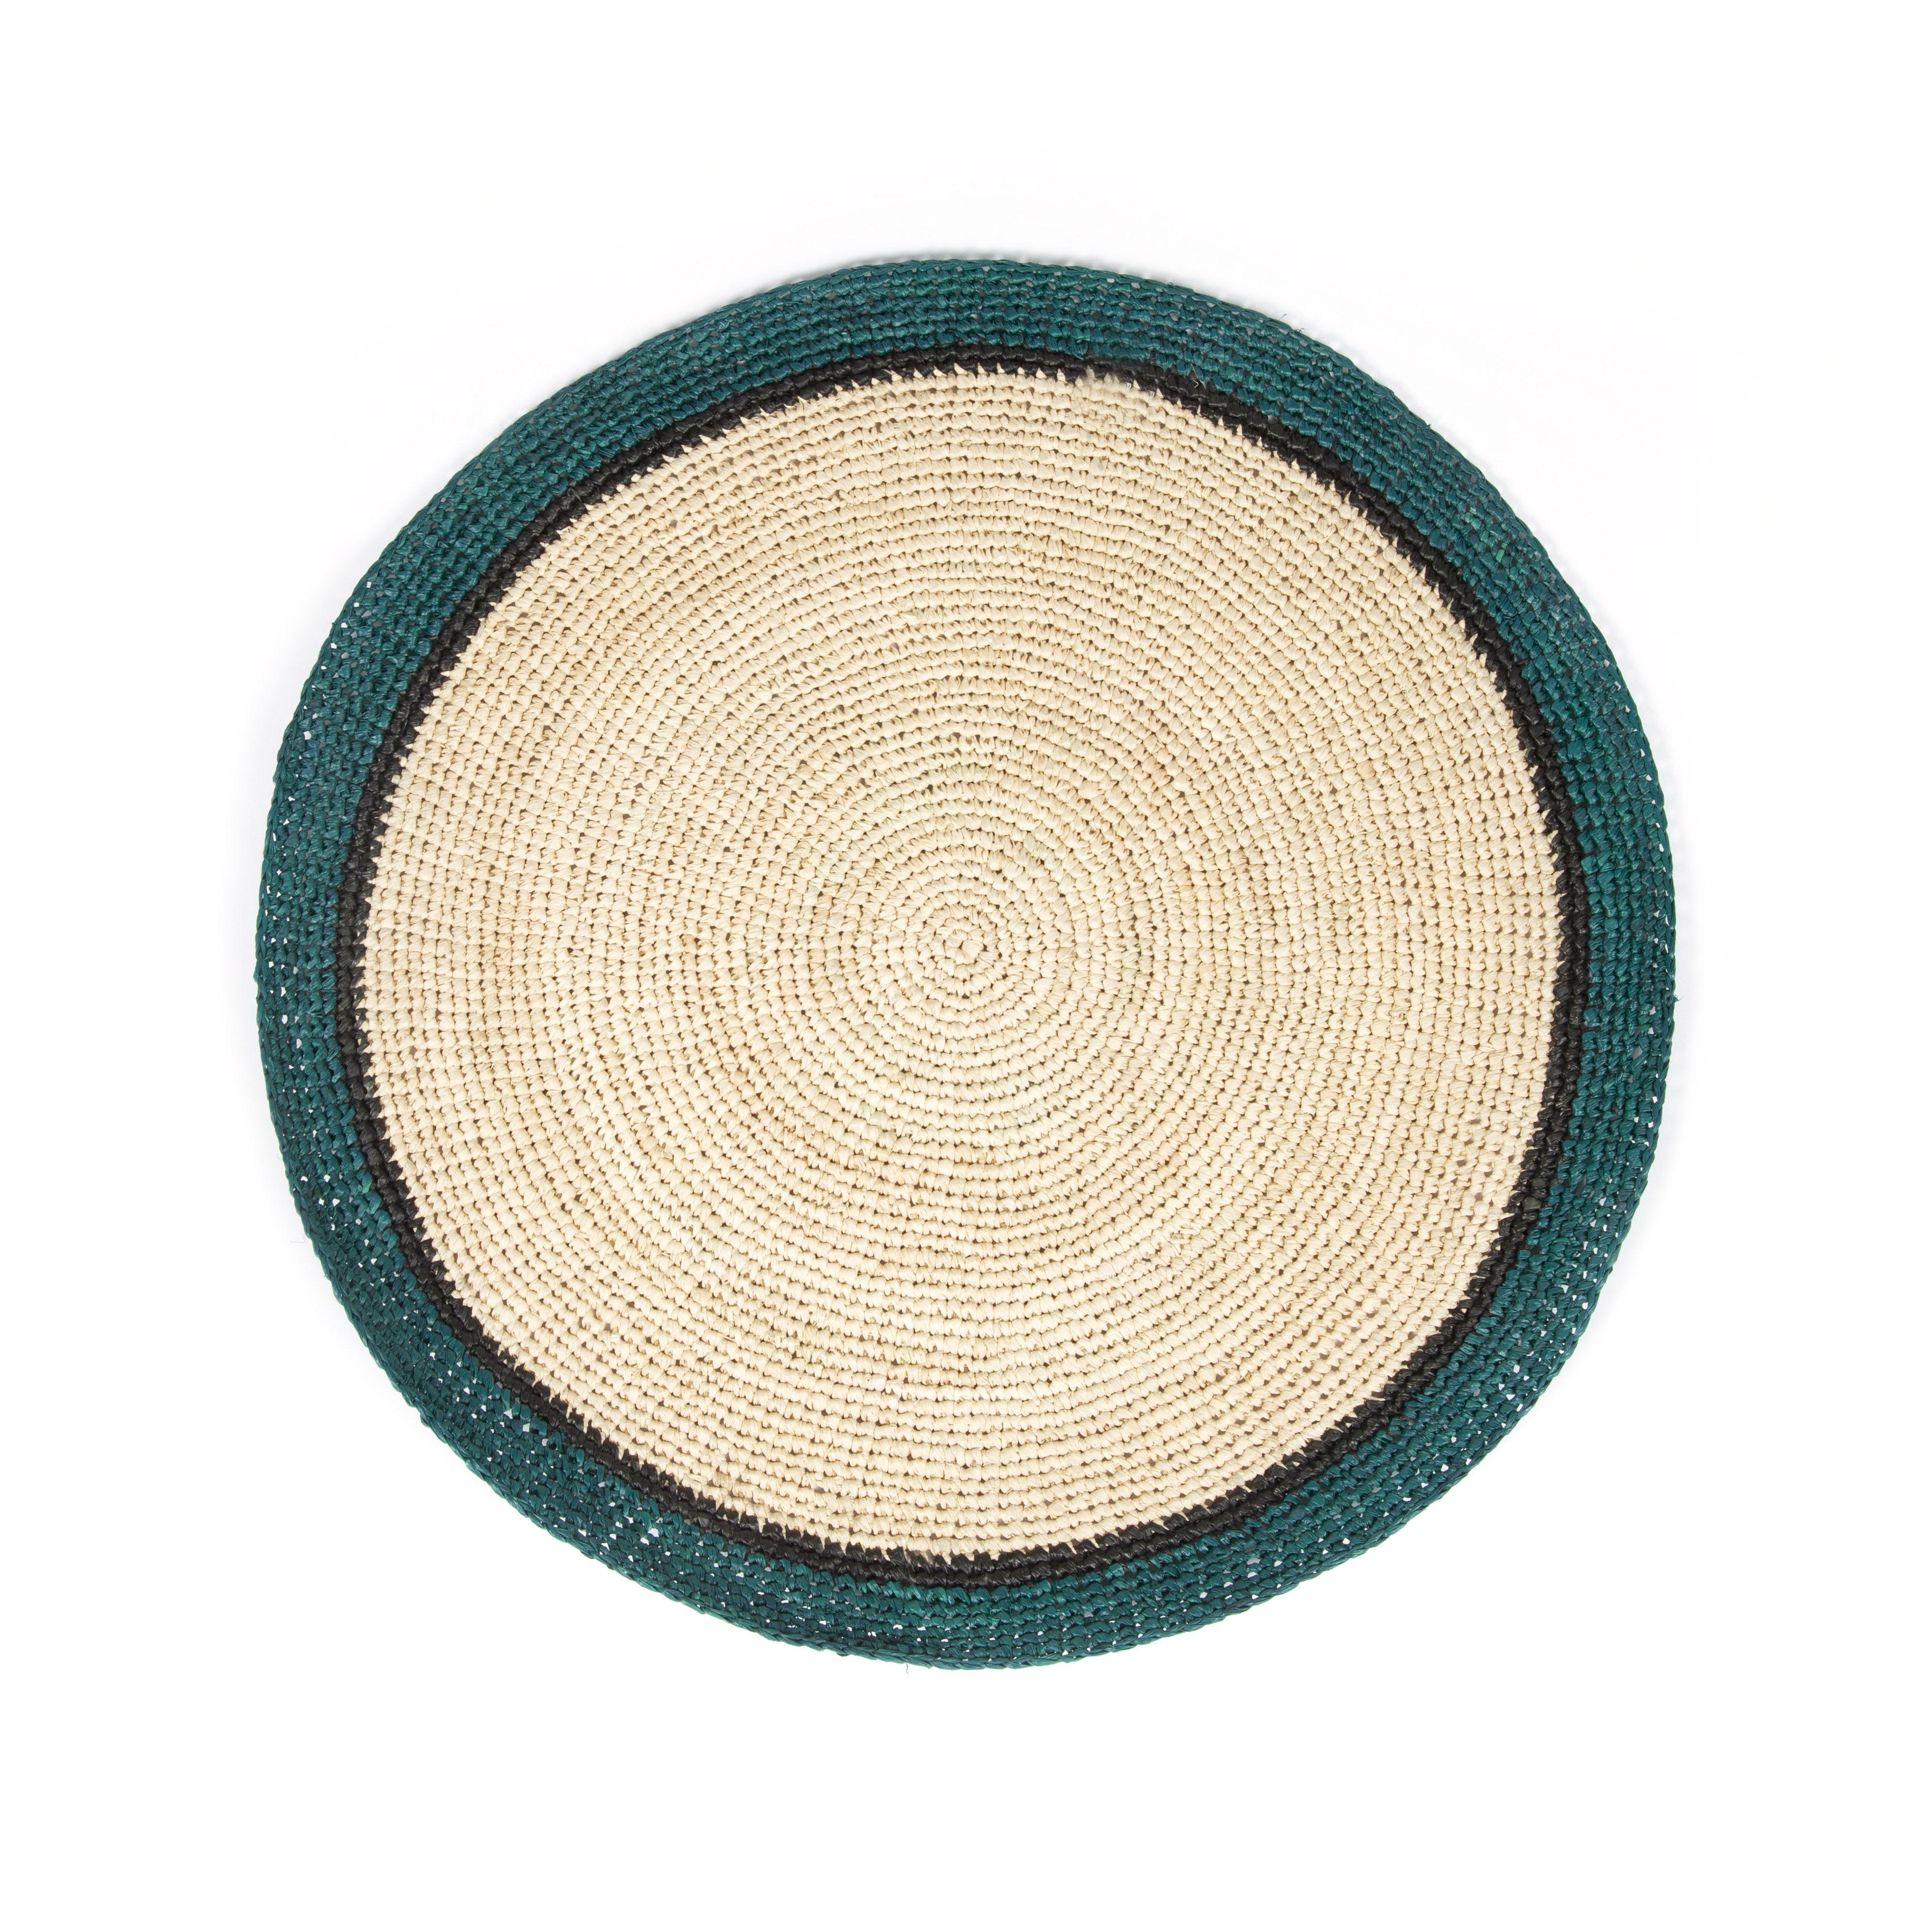 Tableware - Napkins & Tablecloths - Globe Placemat - / Hand-woven raffia by Maison Sarah Lavoine - Sarah blue / Natural - Raffia